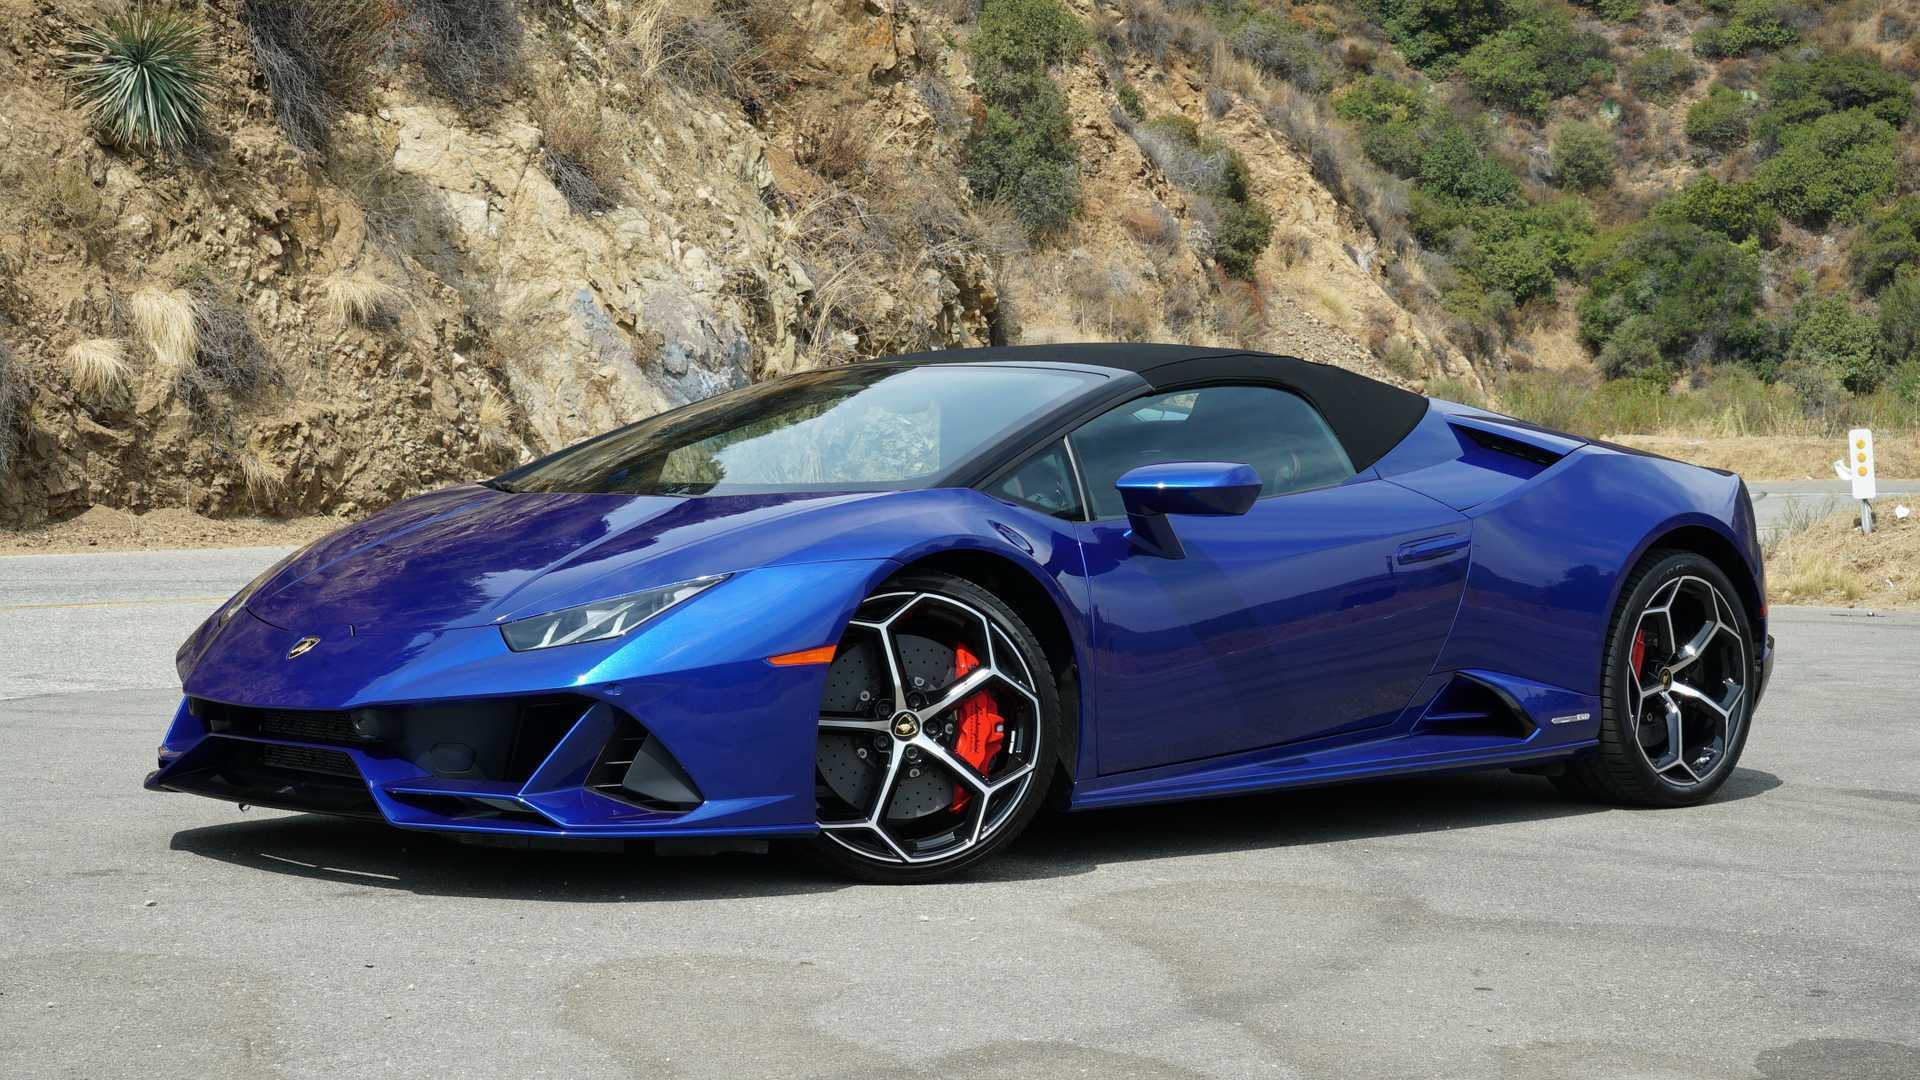 2020 Lamborghini Huracan Spyder: Review